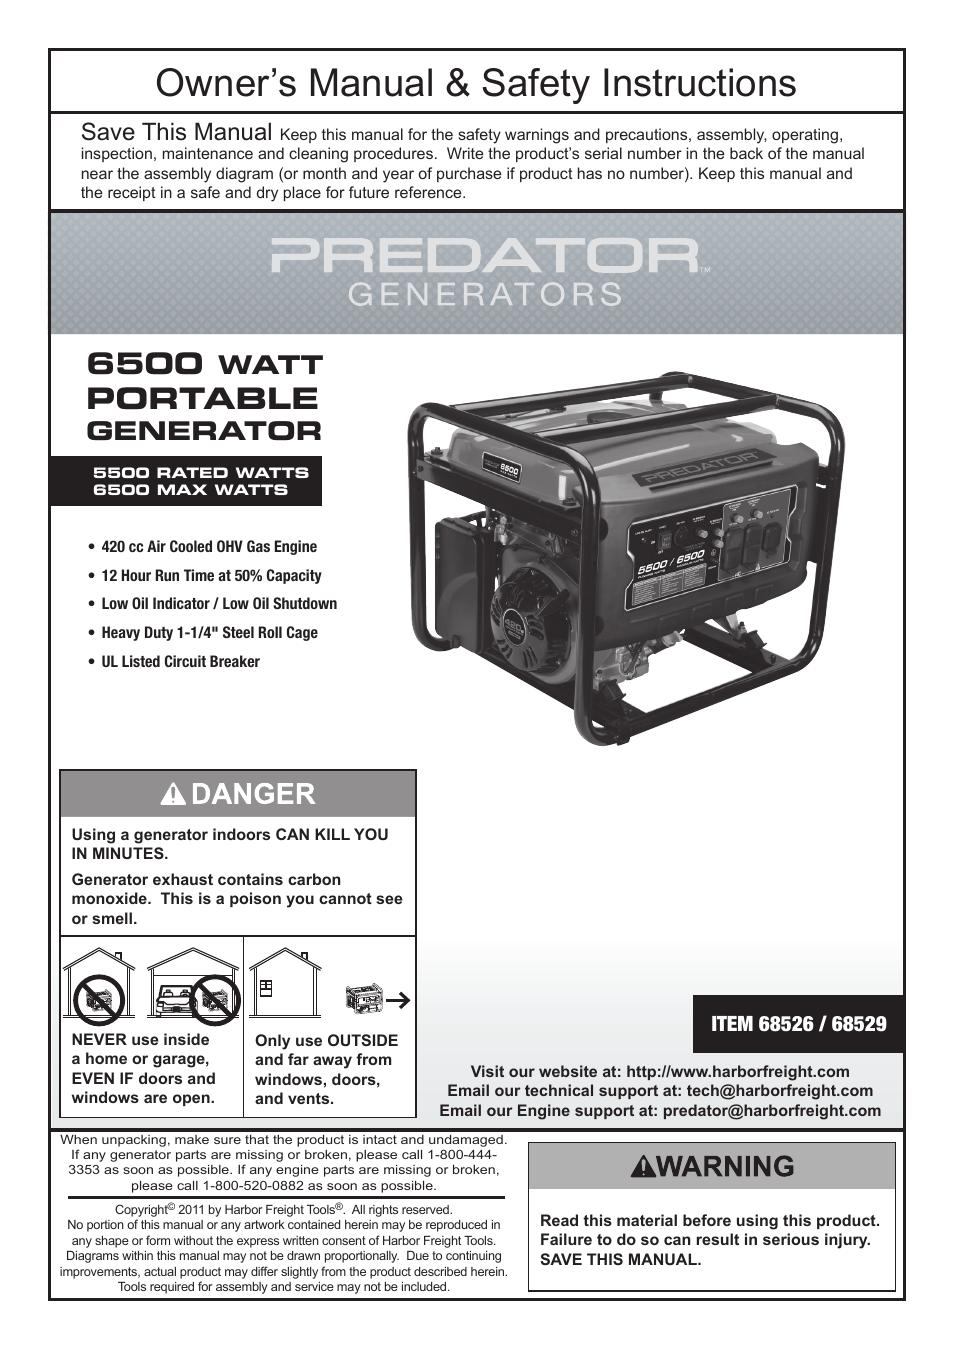 medium resolution of harbor freight tools predator 6500 watt portable generator 68526 user manual 24 pages